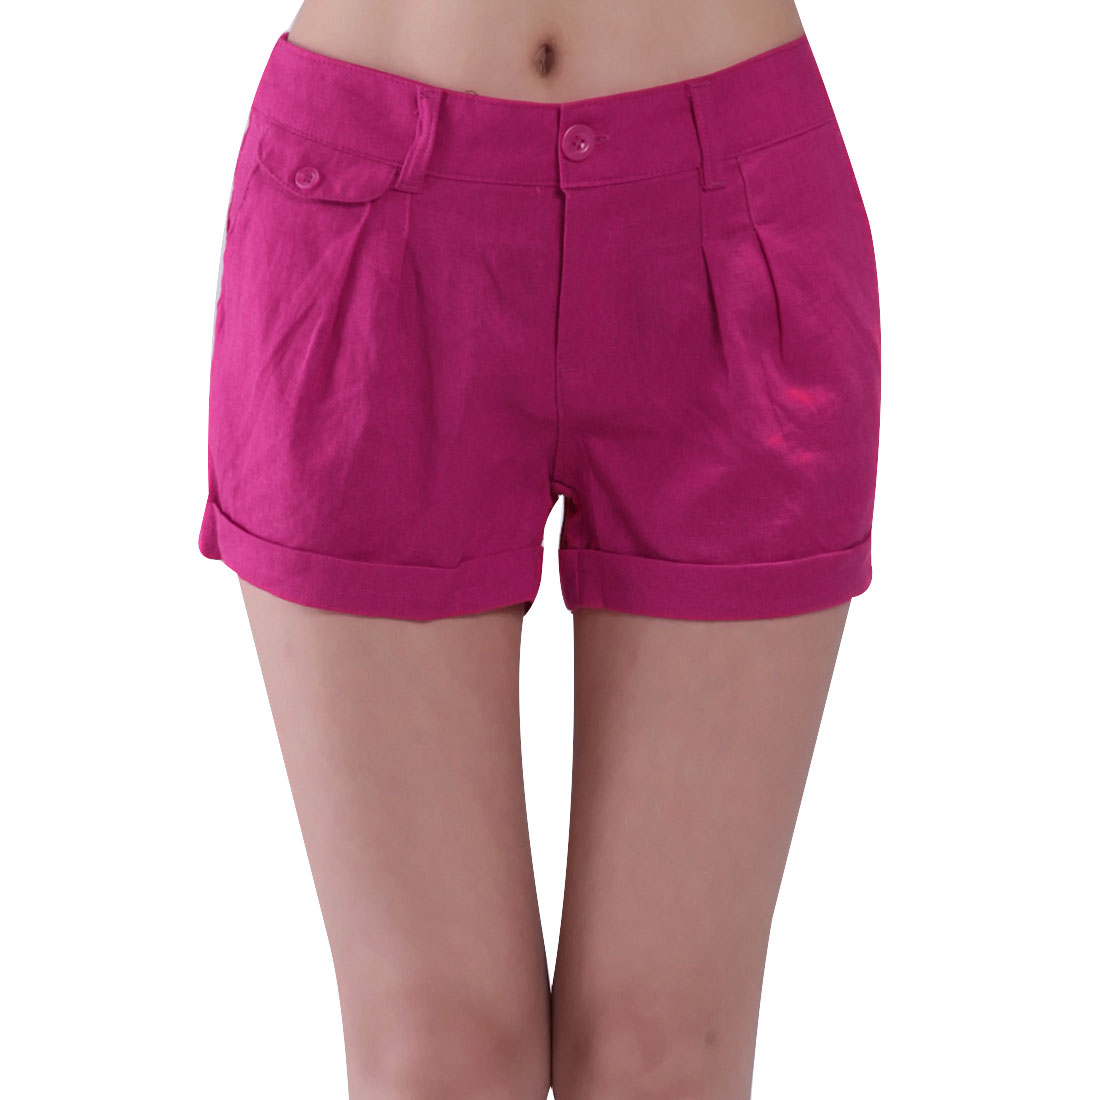 Woman Slanting Pockets Ruffled Button Closure Zip Shorts Fuchsia M